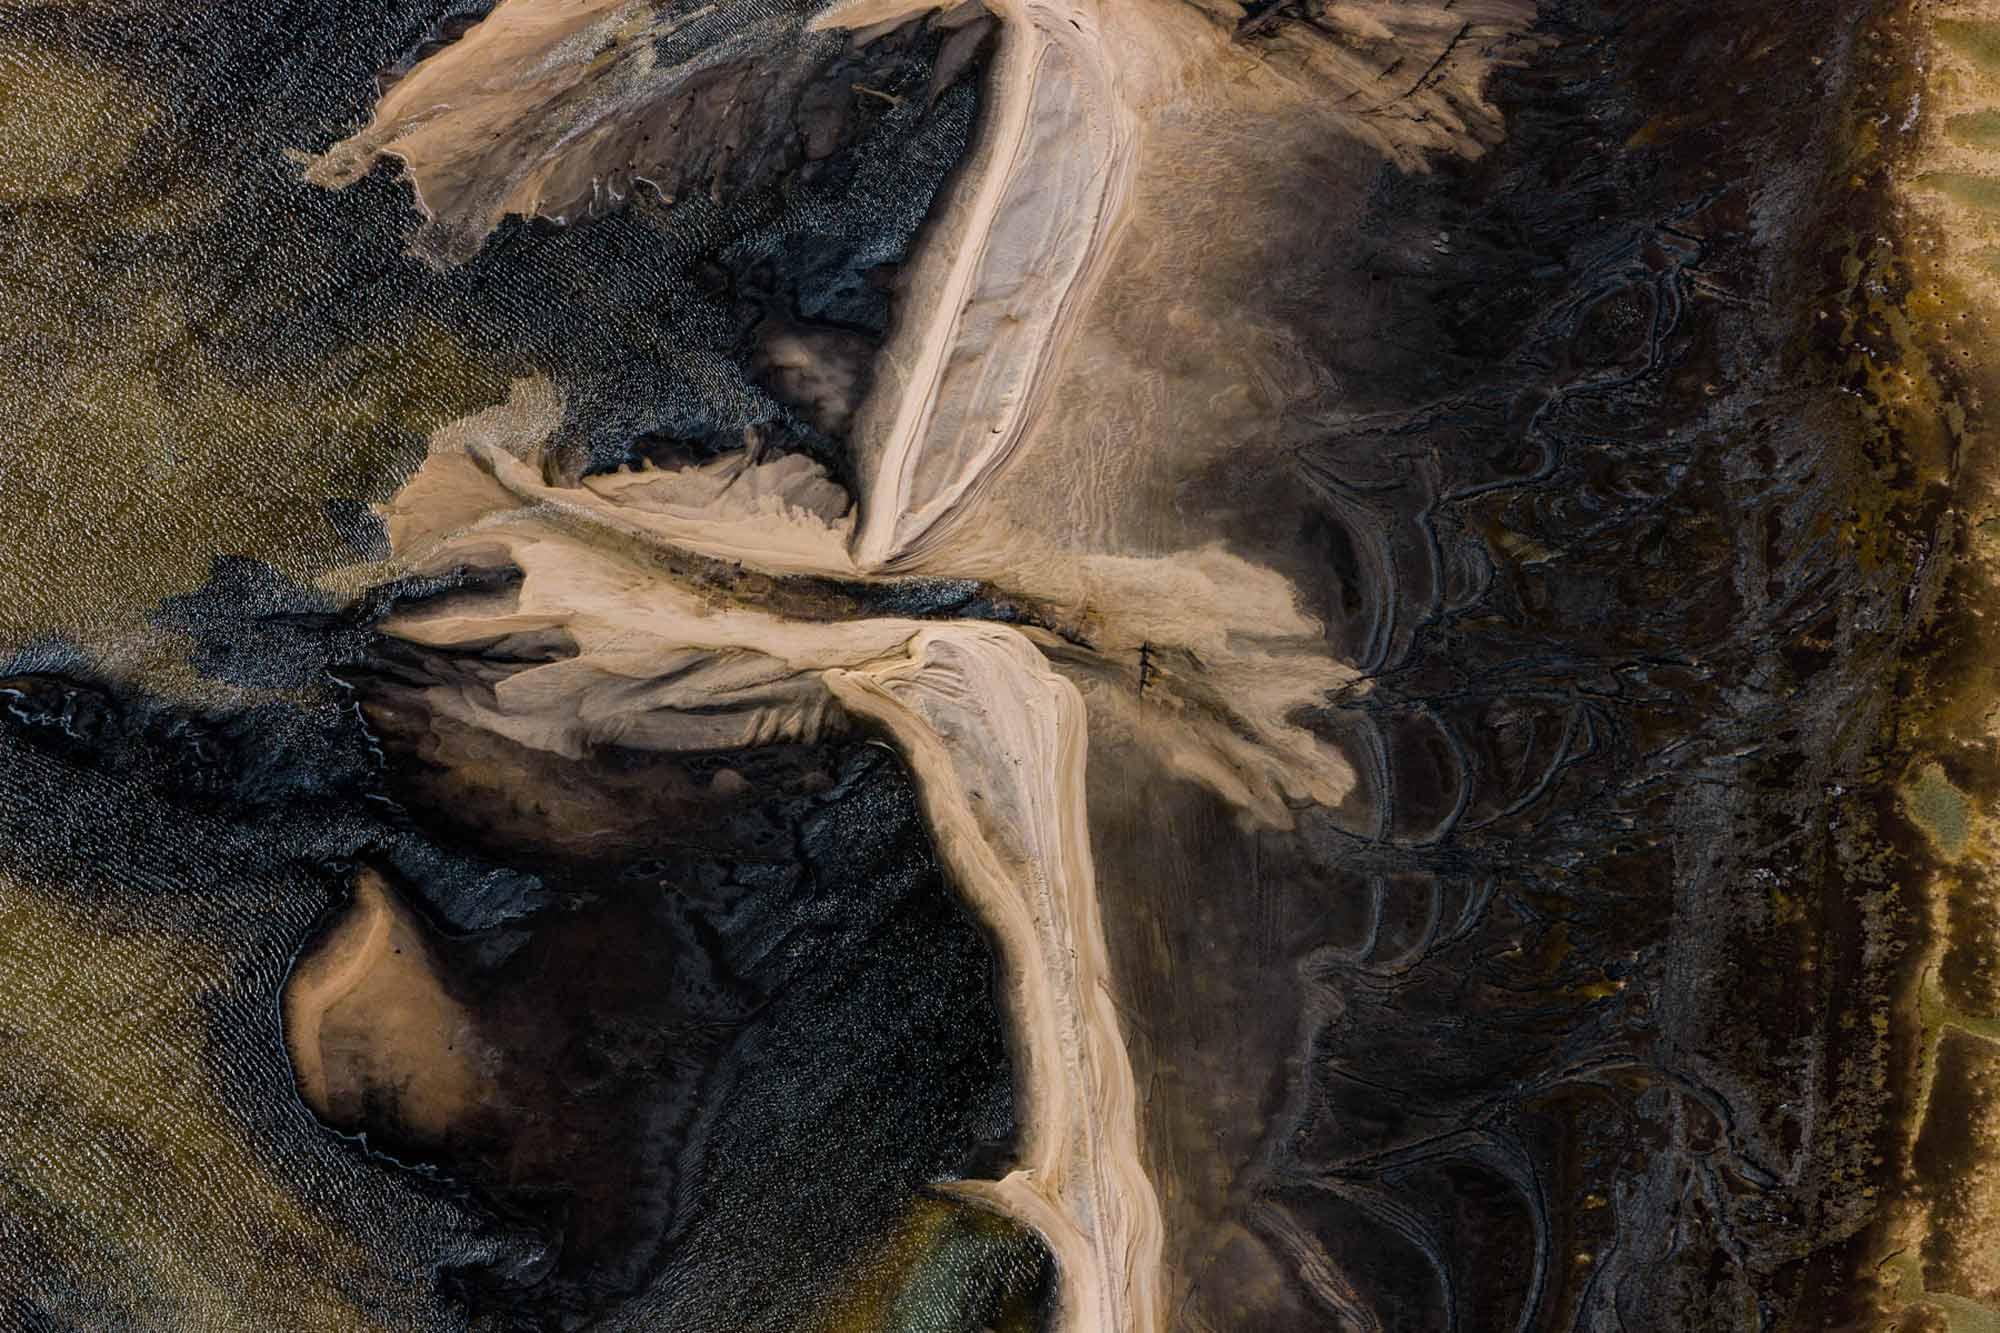 Sandbanks - Yann Arthus-Bertrand